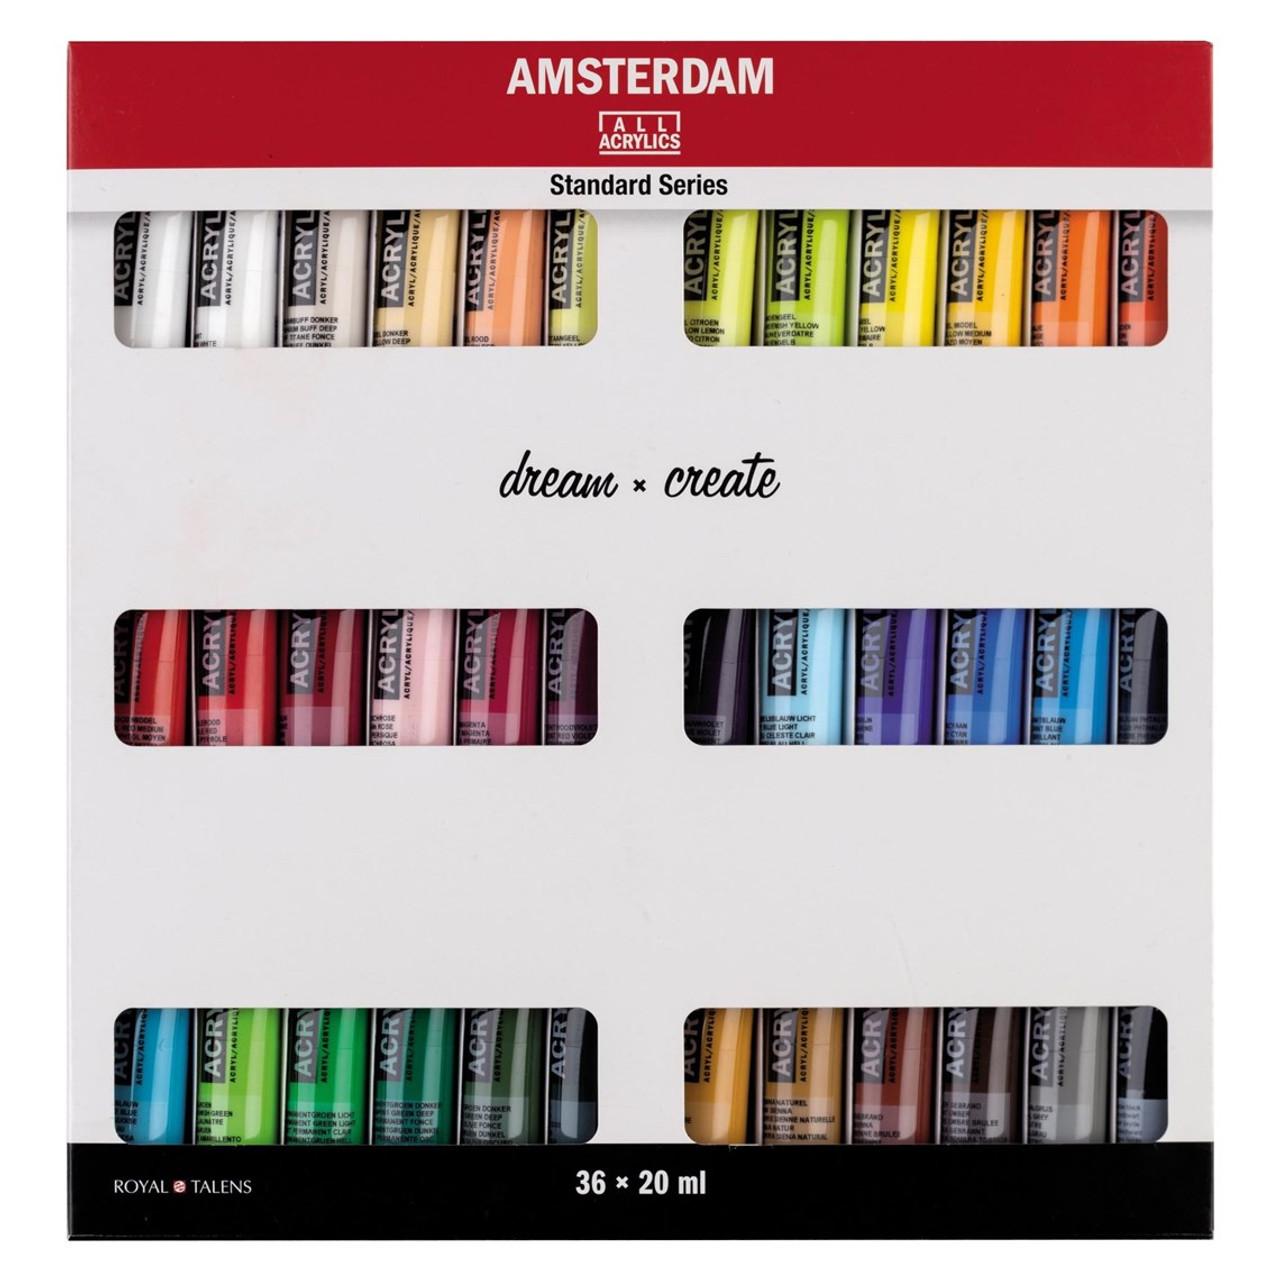 Amsterdam Standard Series Acrylic Paint 36-20ml Set